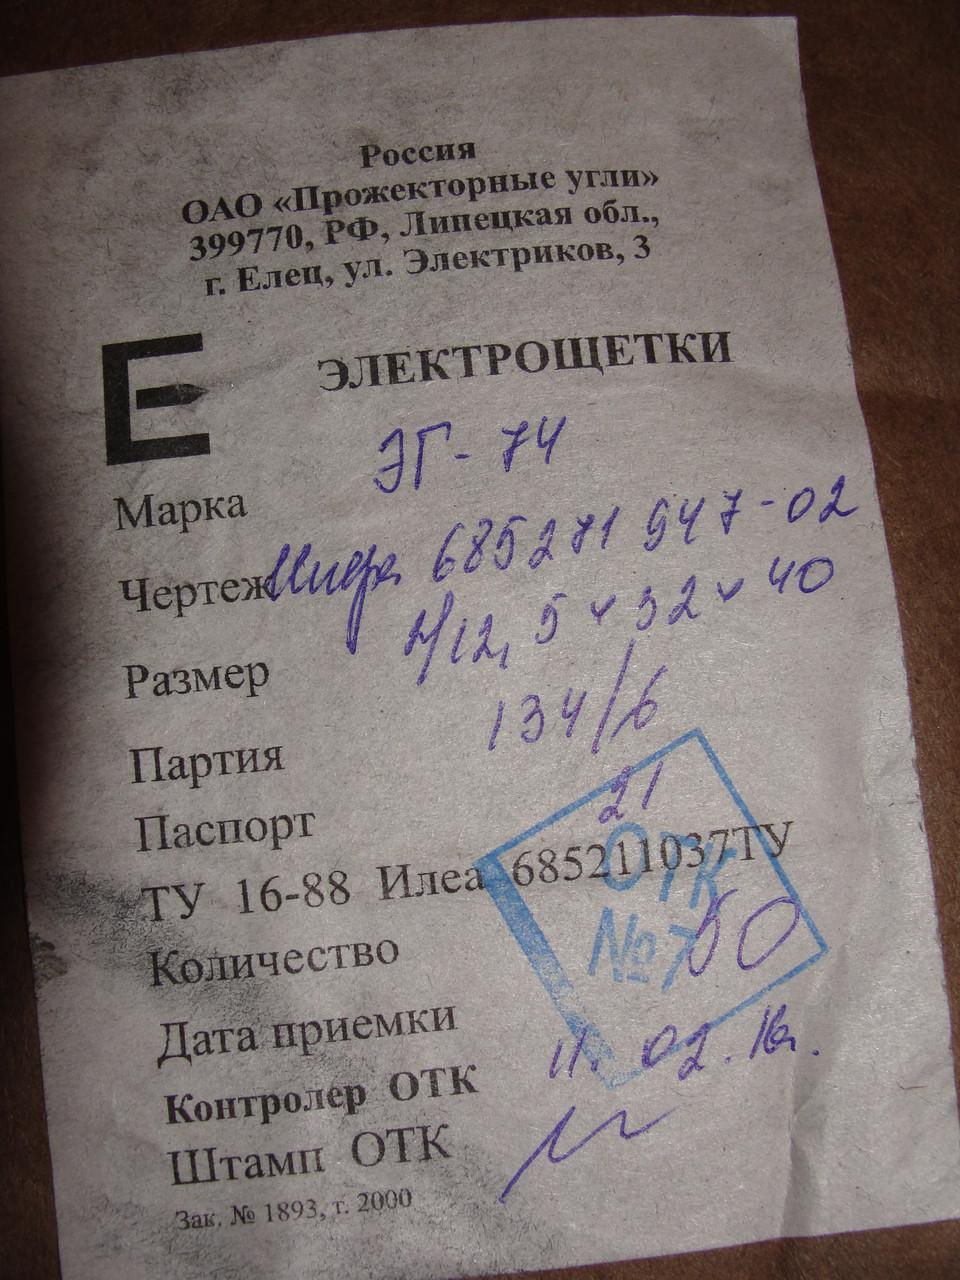 Электрощетка ЭГ 74 2/12,5х32х40 РАСПРОДАЖА